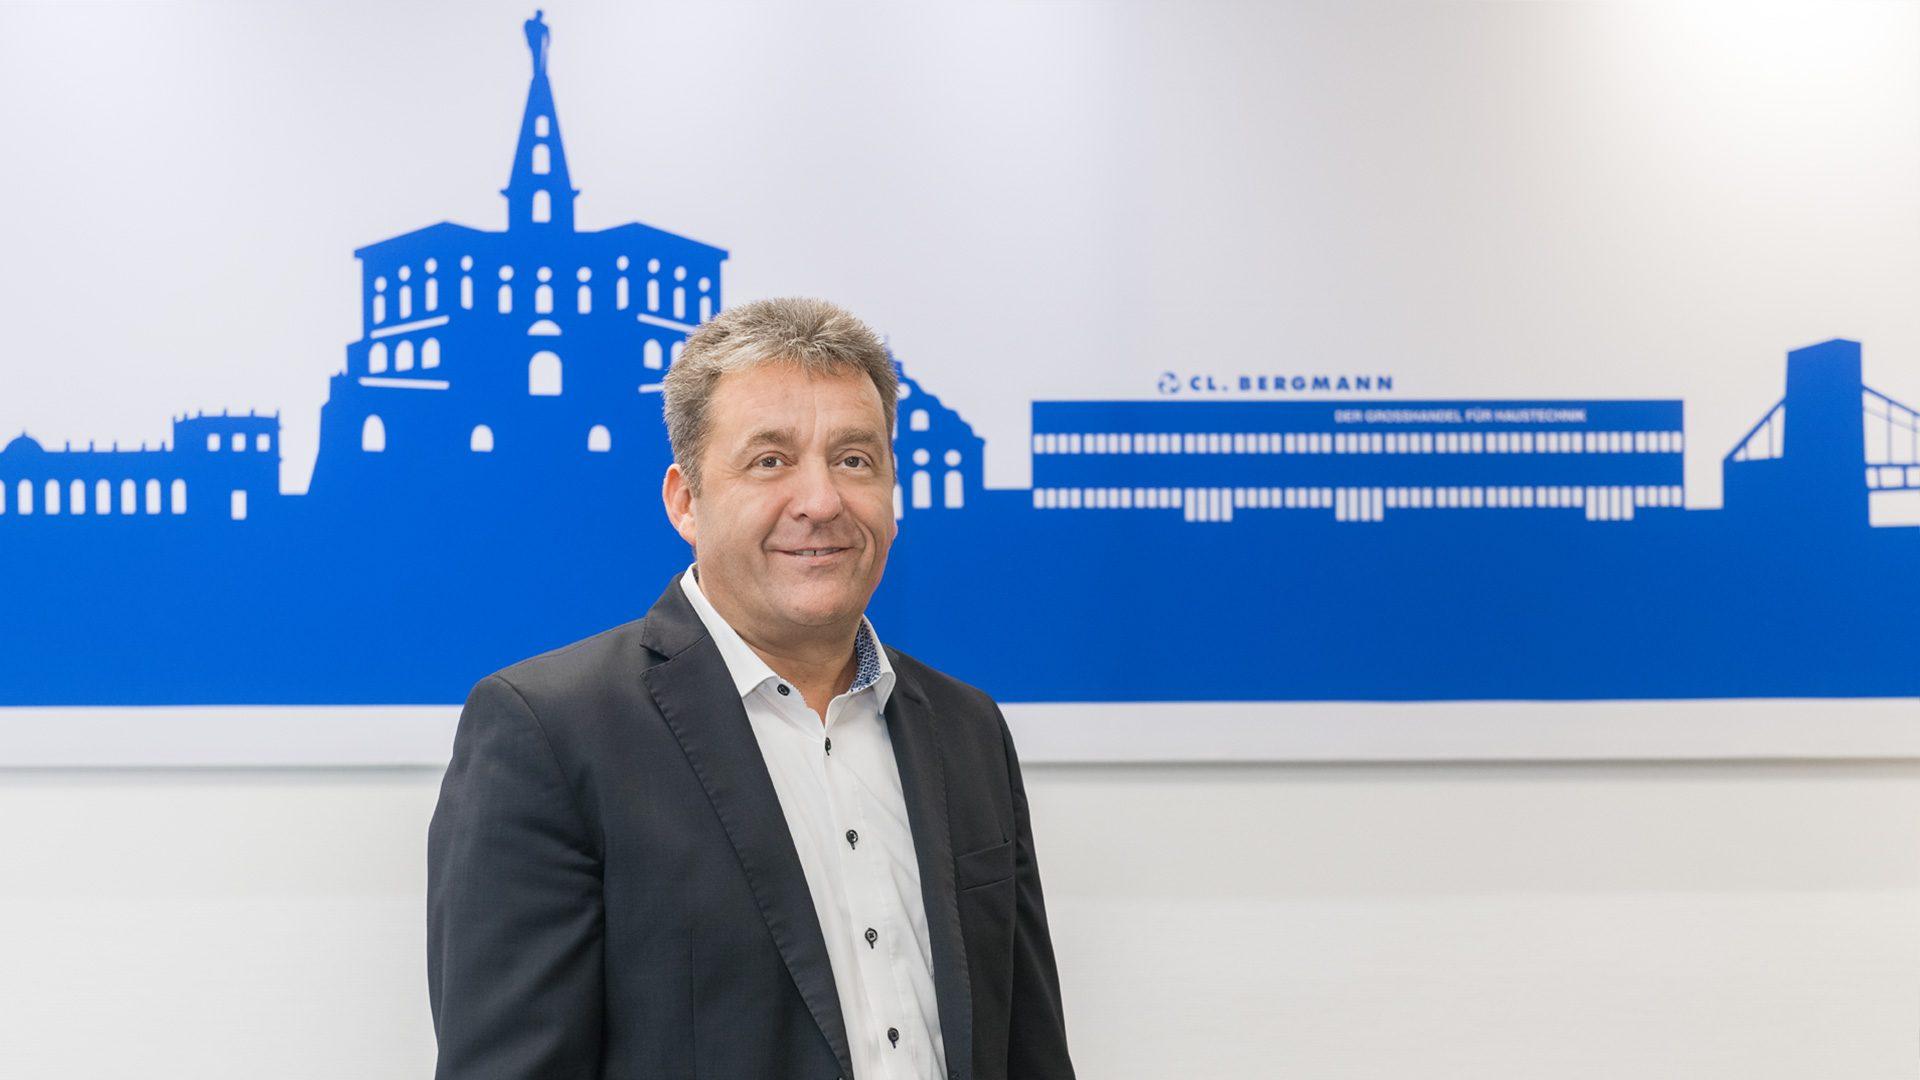 Olaf Dieckmann